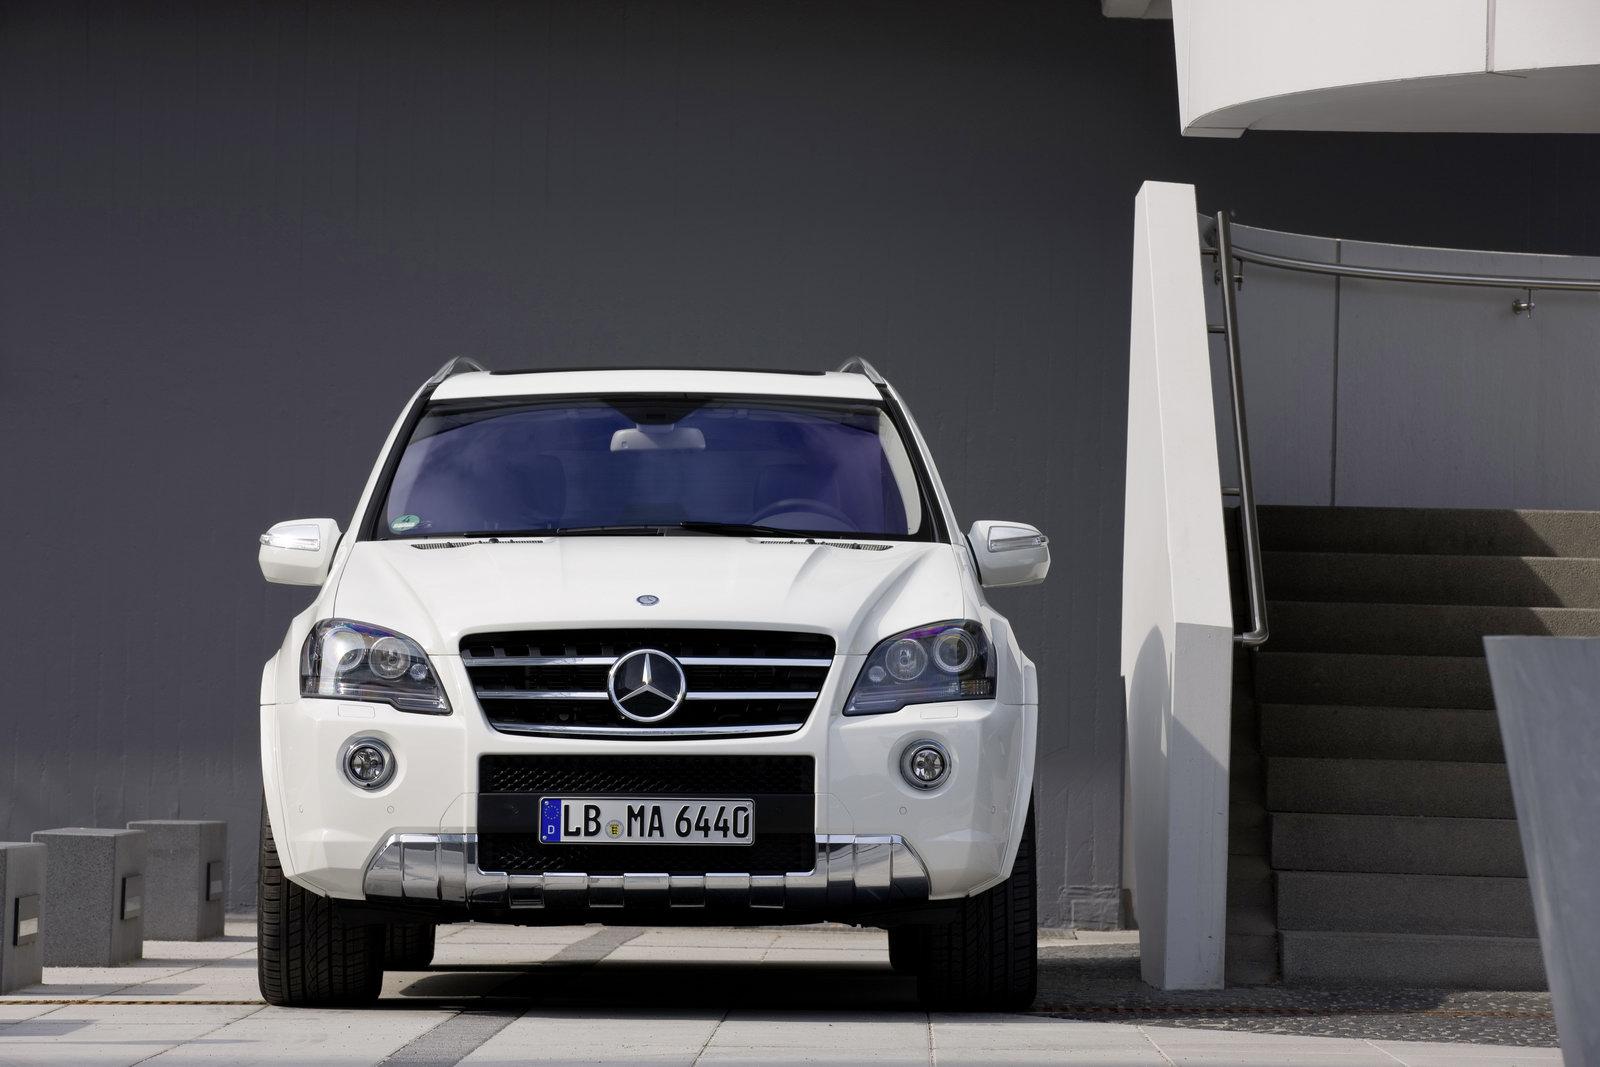 http://1.bp.blogspot.com/_FoXyvaPSnVk/TA-sfSHK6cI/AAAAAAAC8BU/Jd2EXDKFV_g/s1600/2011-Mercedes-ML63-AMG-10.jpg